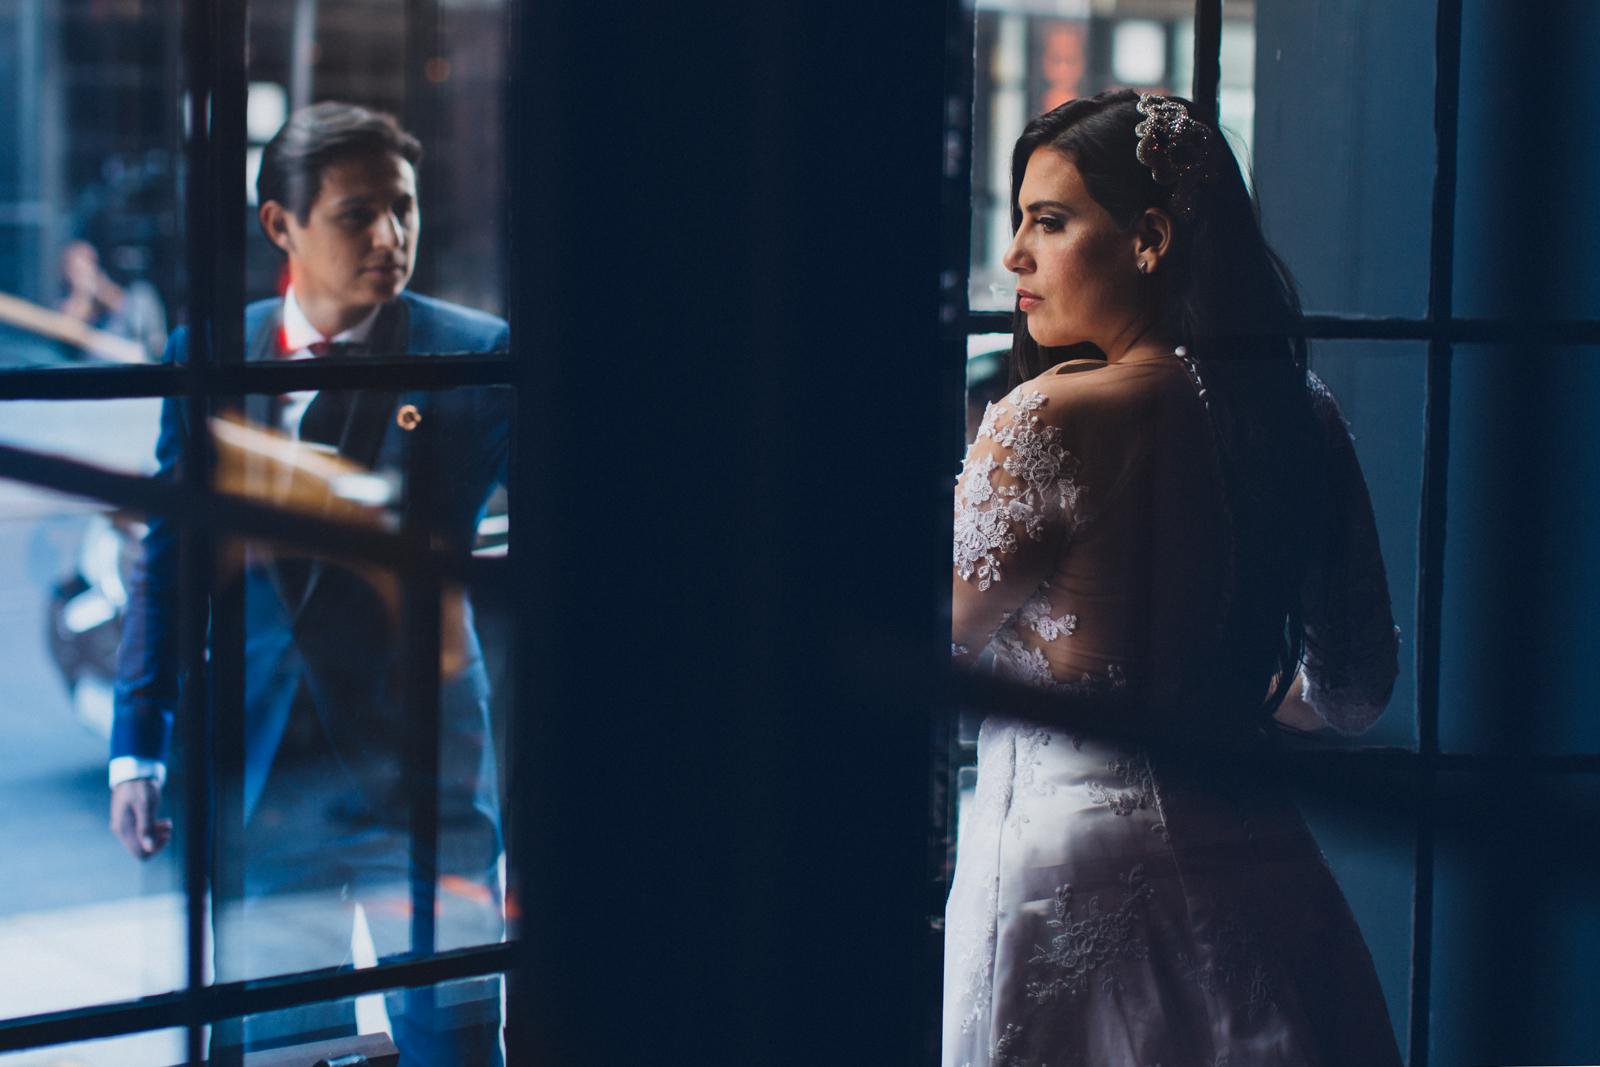 NYC Wedding Photography Lofts at Prince Brooklyn NYC Photographer Boris Zaretsky _B2C5435-Edit.jpg